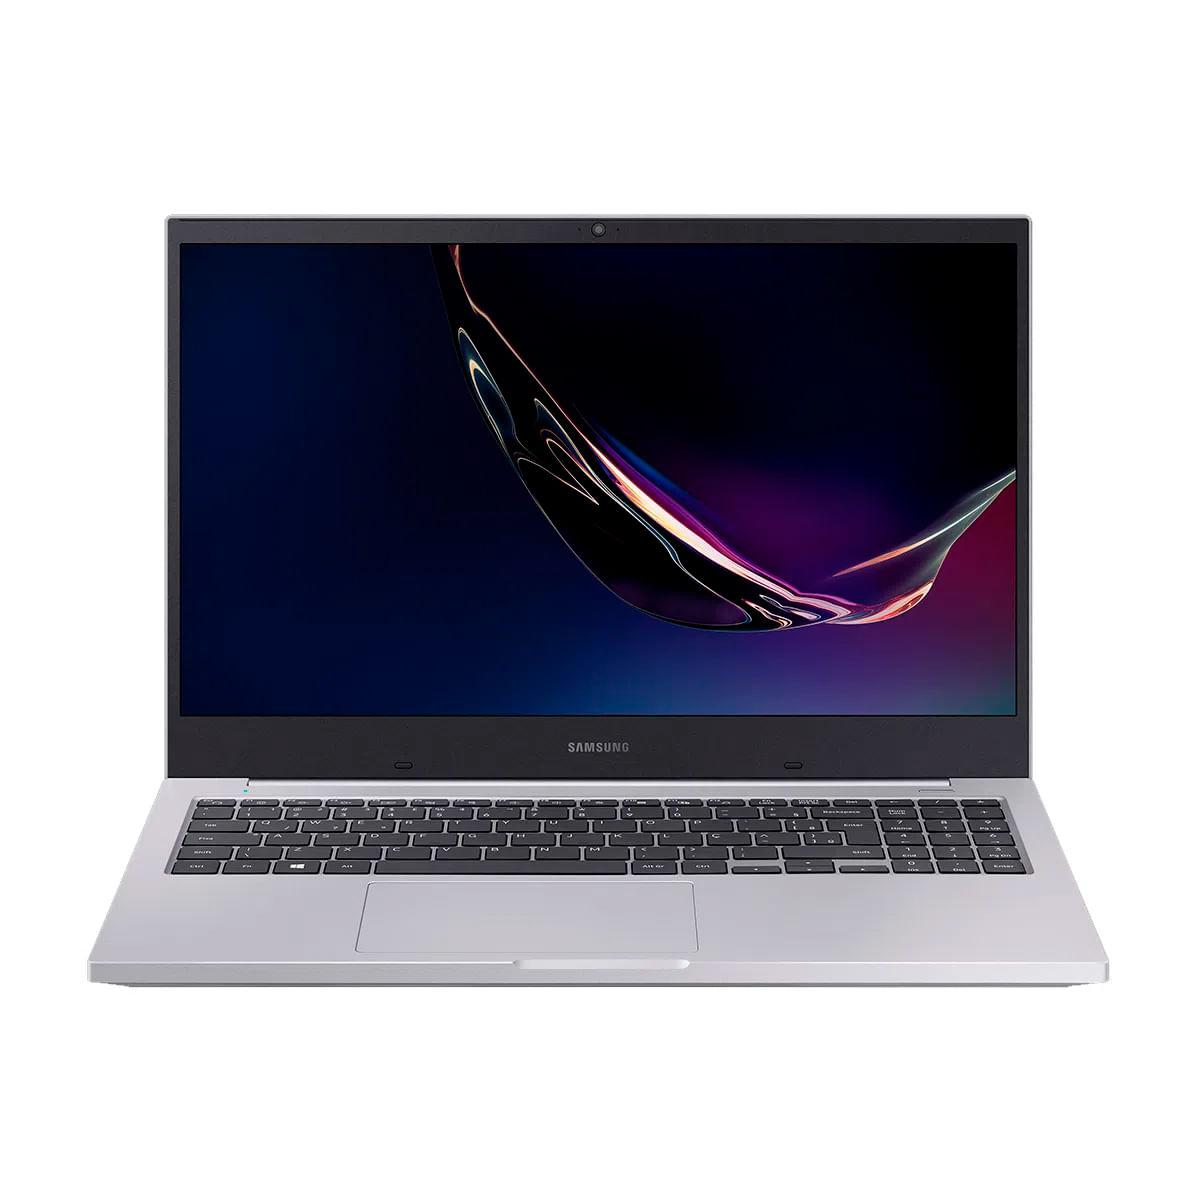 Notebook - Samsung Np550xcj-xs1br I7-10510u 1.80ghz 8gb 1tb Padrão Geforce Mx110 Windows 10 Home Book X50 15,6